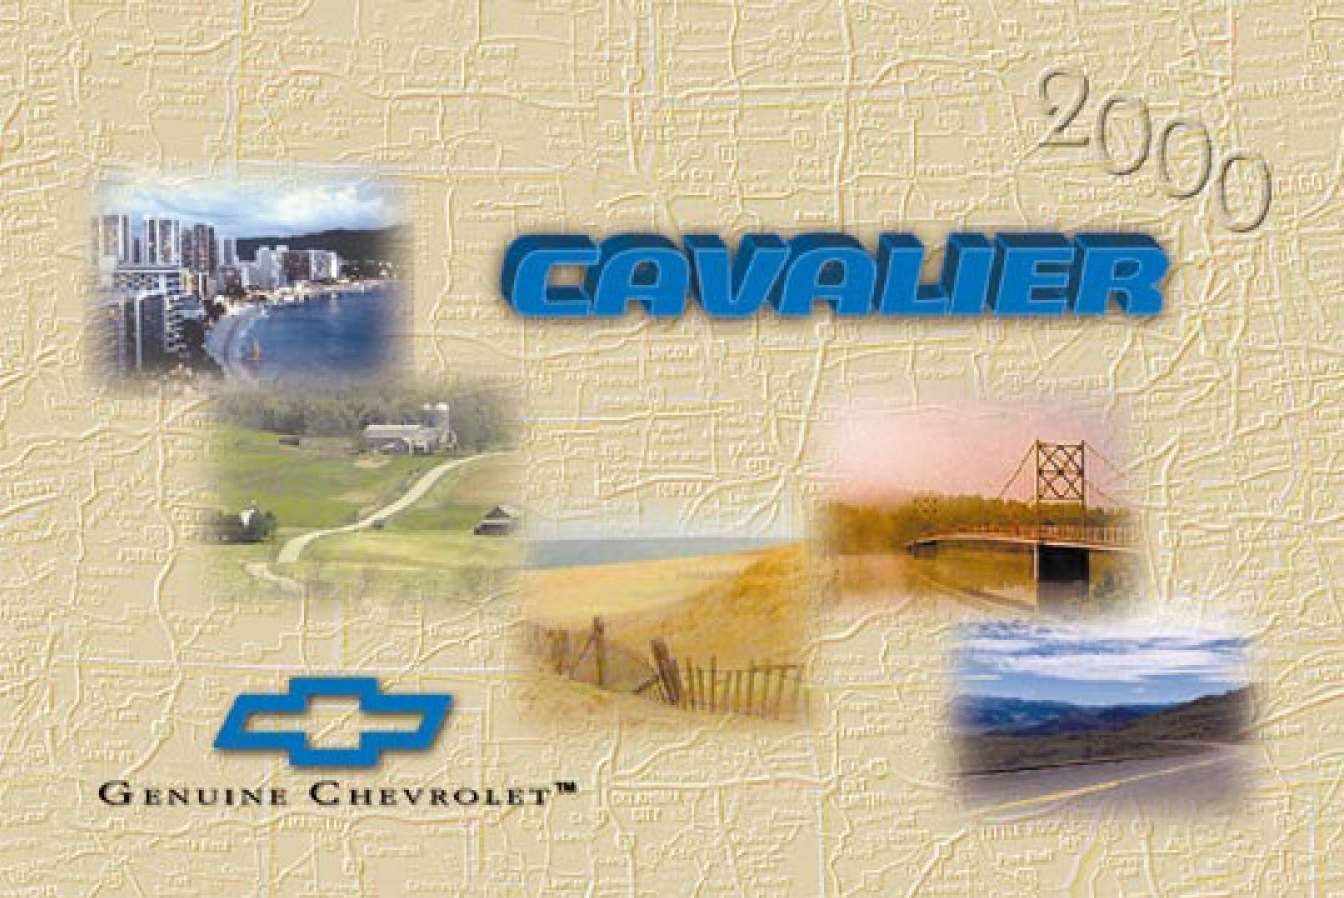 Chevrolet Cavalier 2000 Owner S Manual Has Been Published On Procarmanuals Com Https Procarmanuals Com Chevrolet Chevrolet Cavalier Owners Manuals Chevrolet